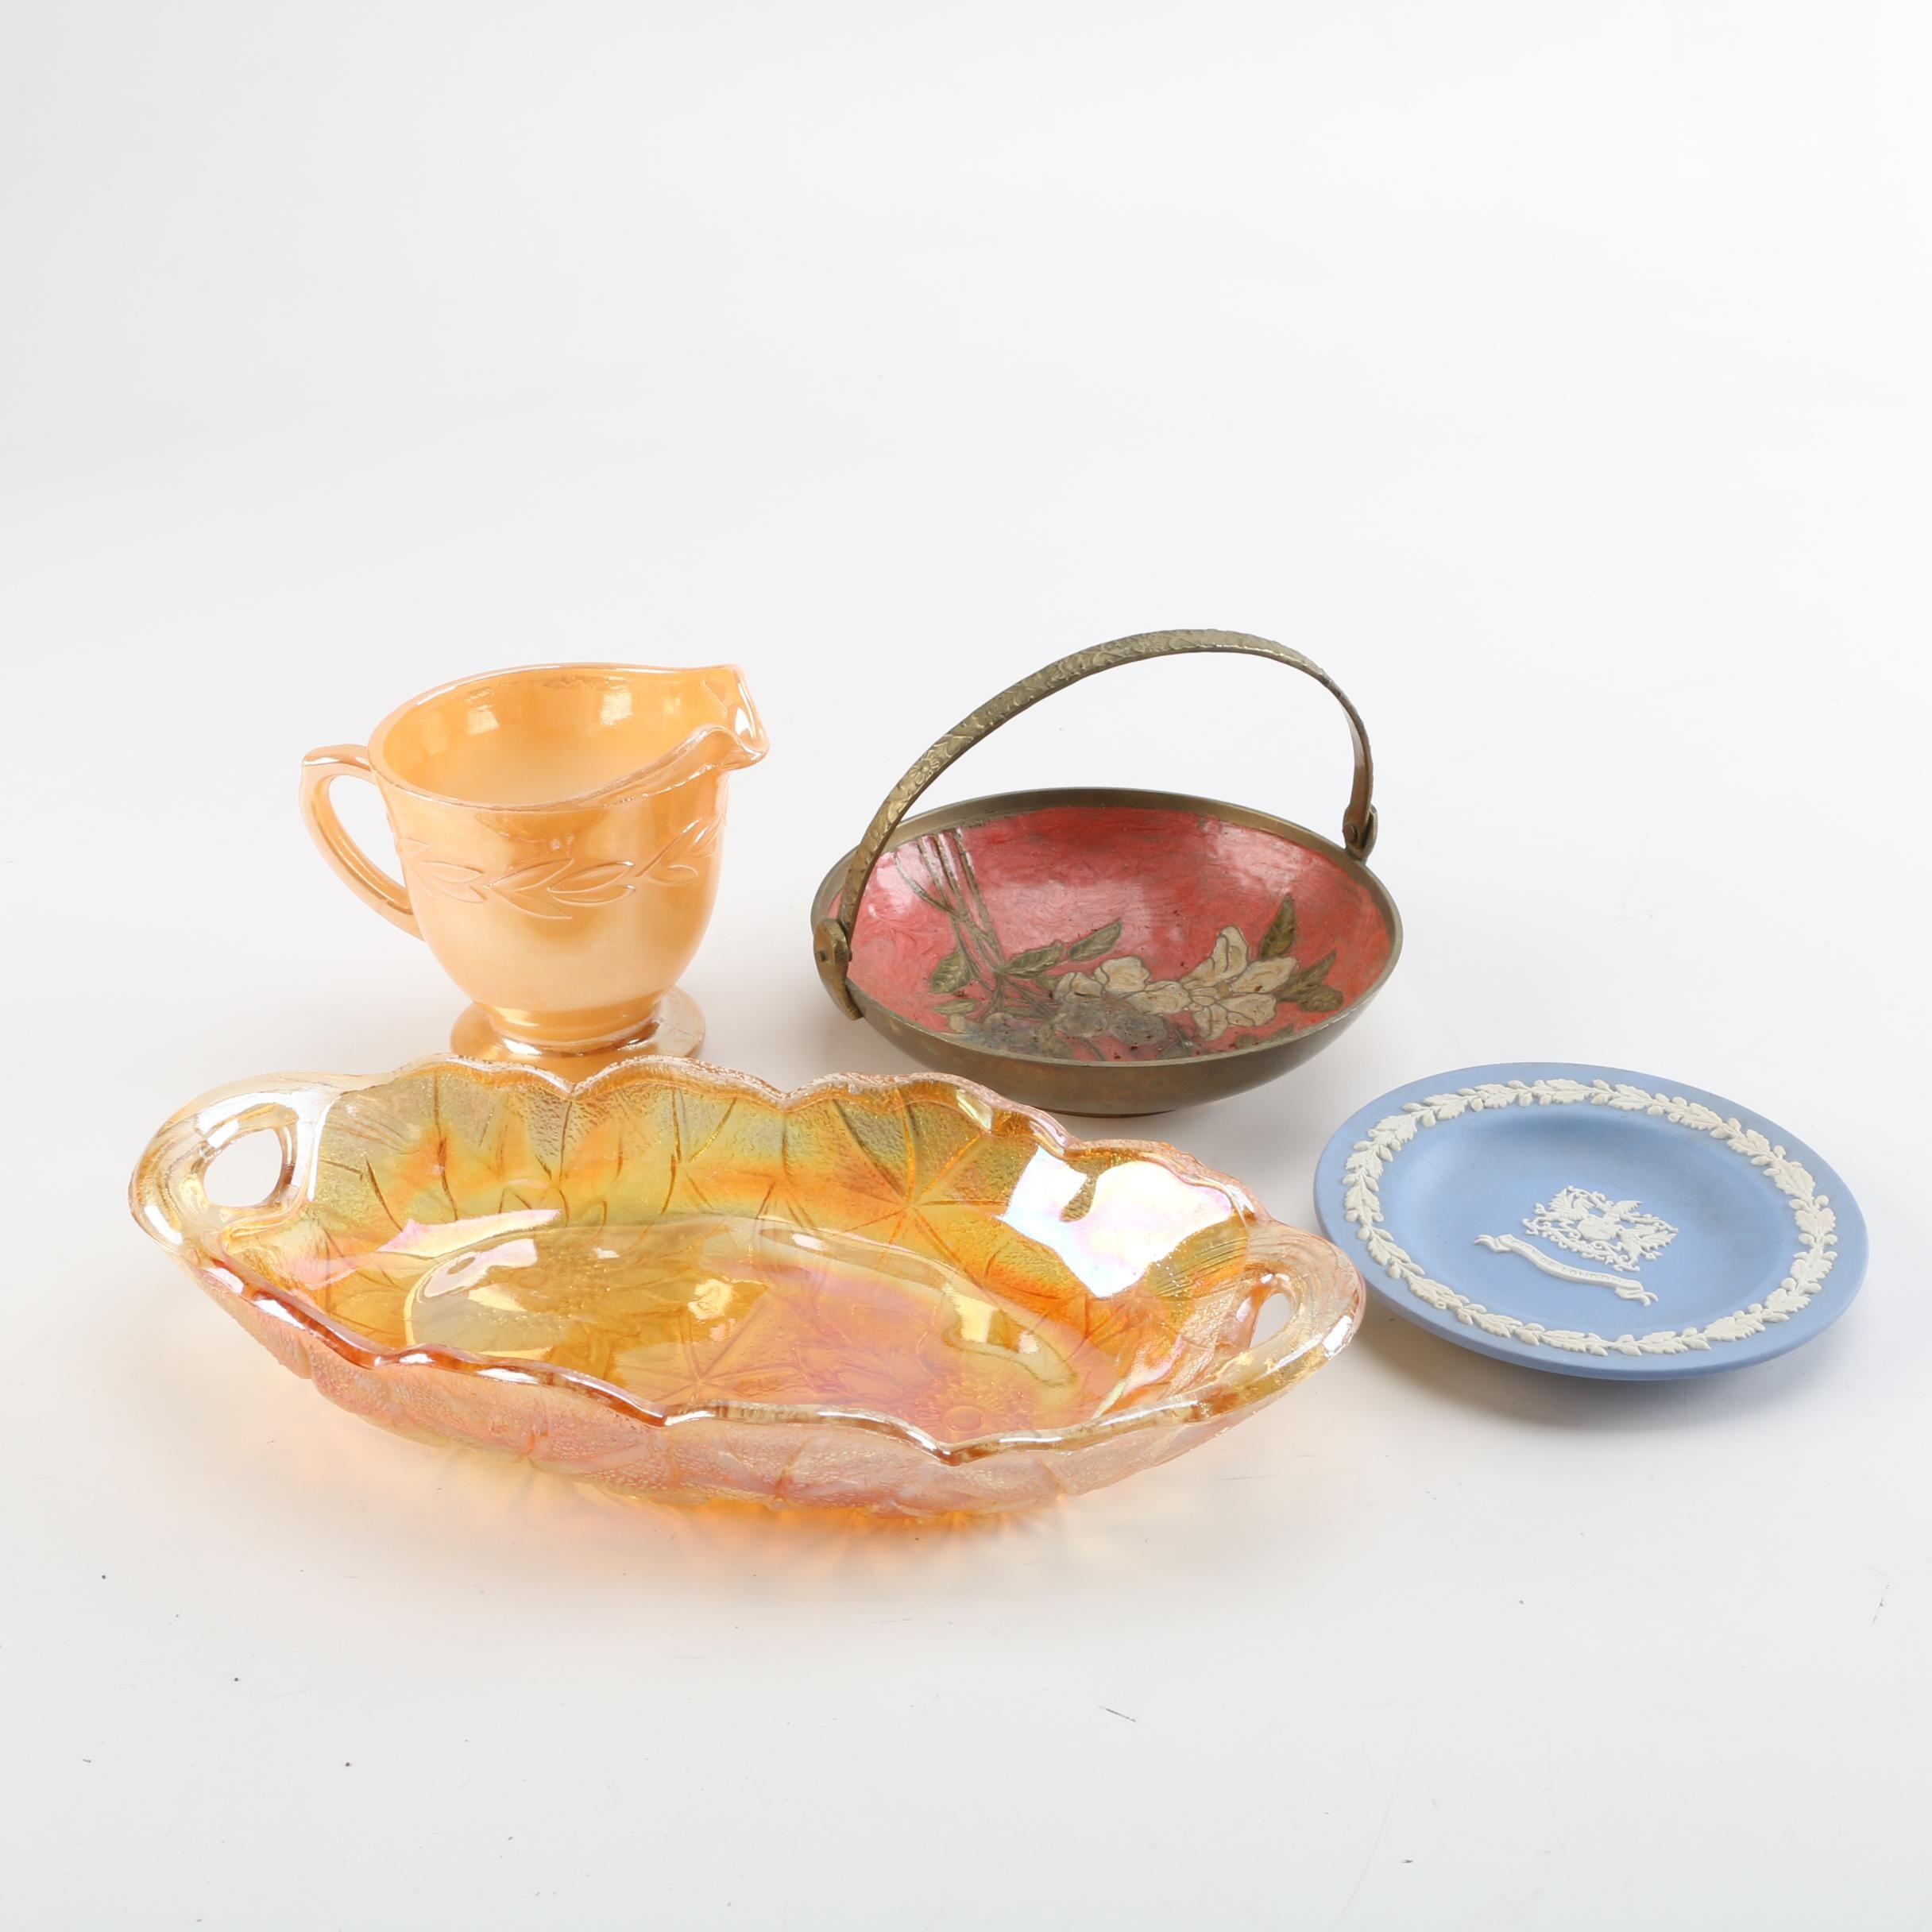 "Wedgwood Jasperware Plate, Fire-King ""Peach Laurel Lustre"" Creamer and More"